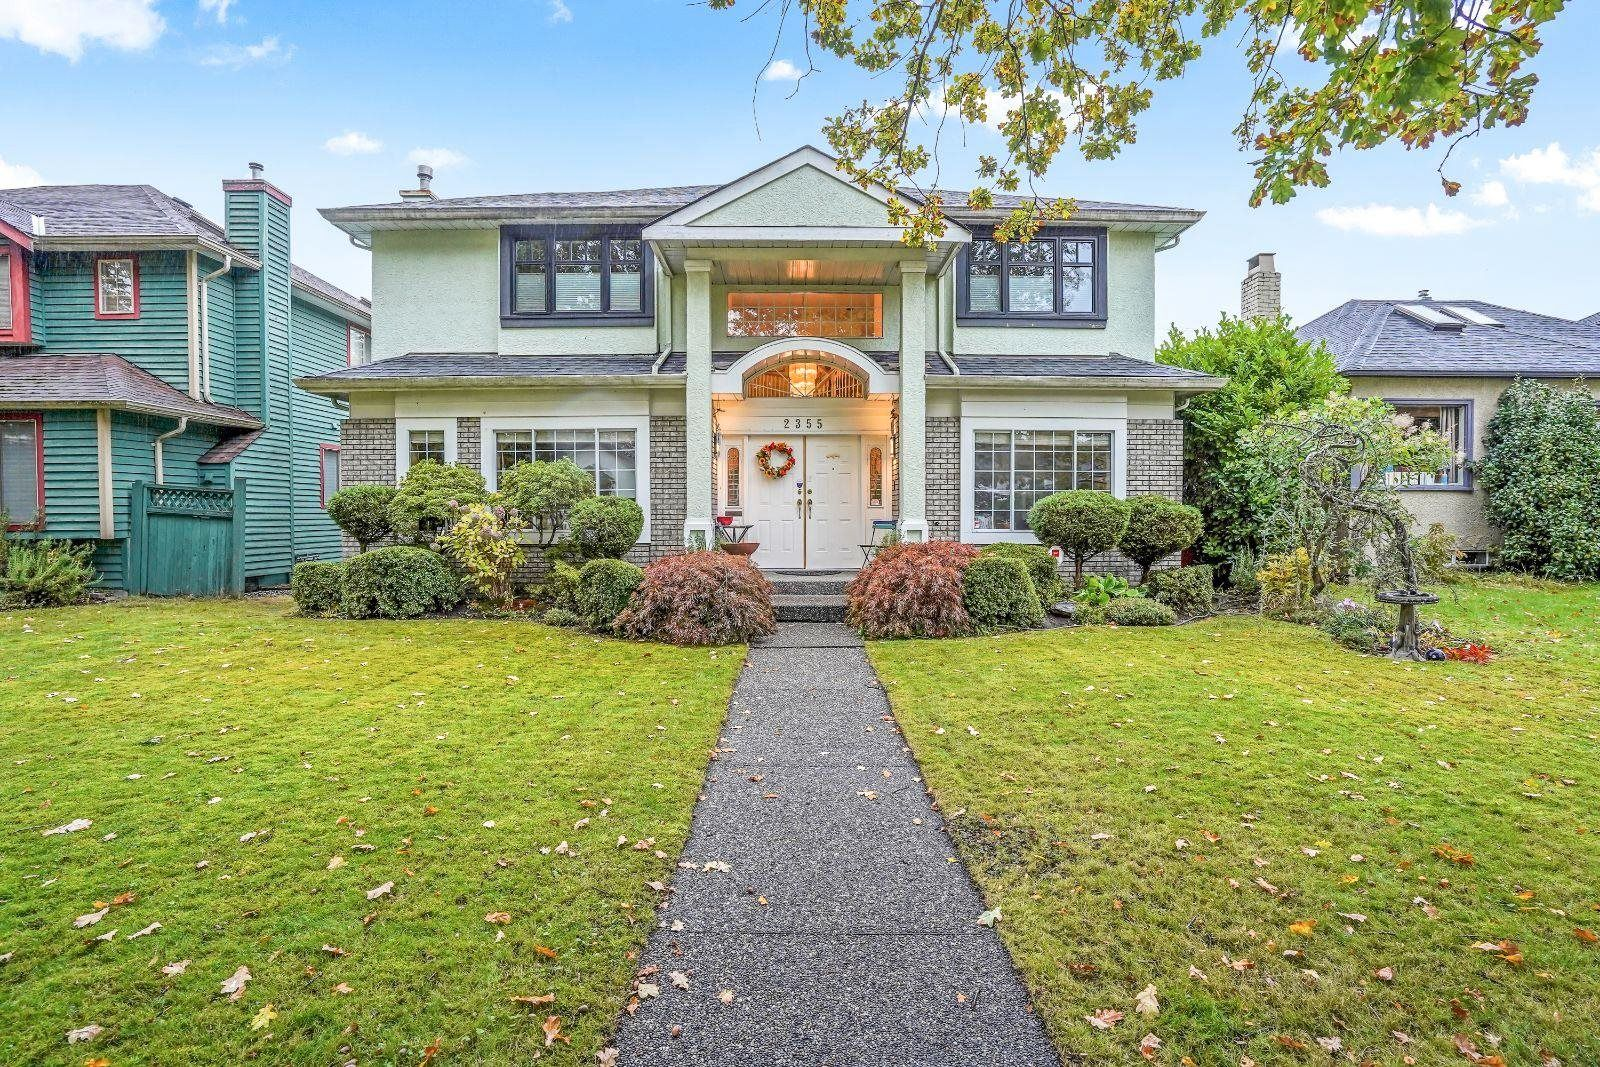 "Main Photo: 2355 W 13TH Avenue in Vancouver: Kitsilano House for sale in ""KITSILANO"" (Vancouver West)  : MLS®# R2625975"